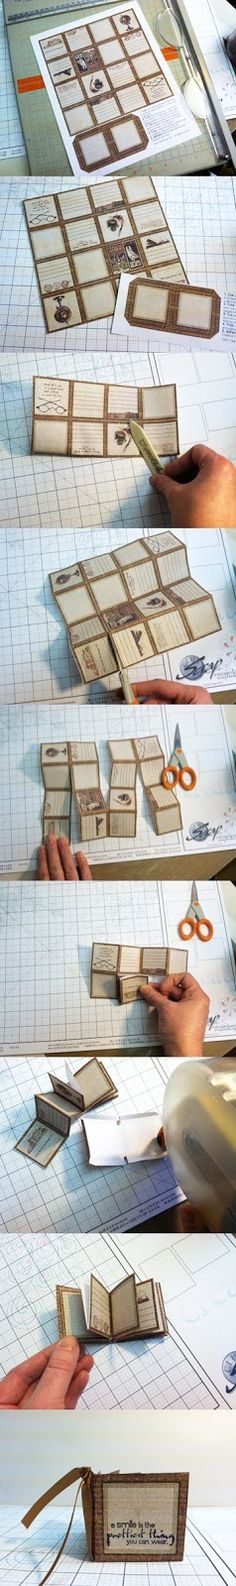 Club Scrap Creates: Mini Maze Book--Free Printable! #printable #freebies  http://www.clubscrapcommunity.com/freemazebook